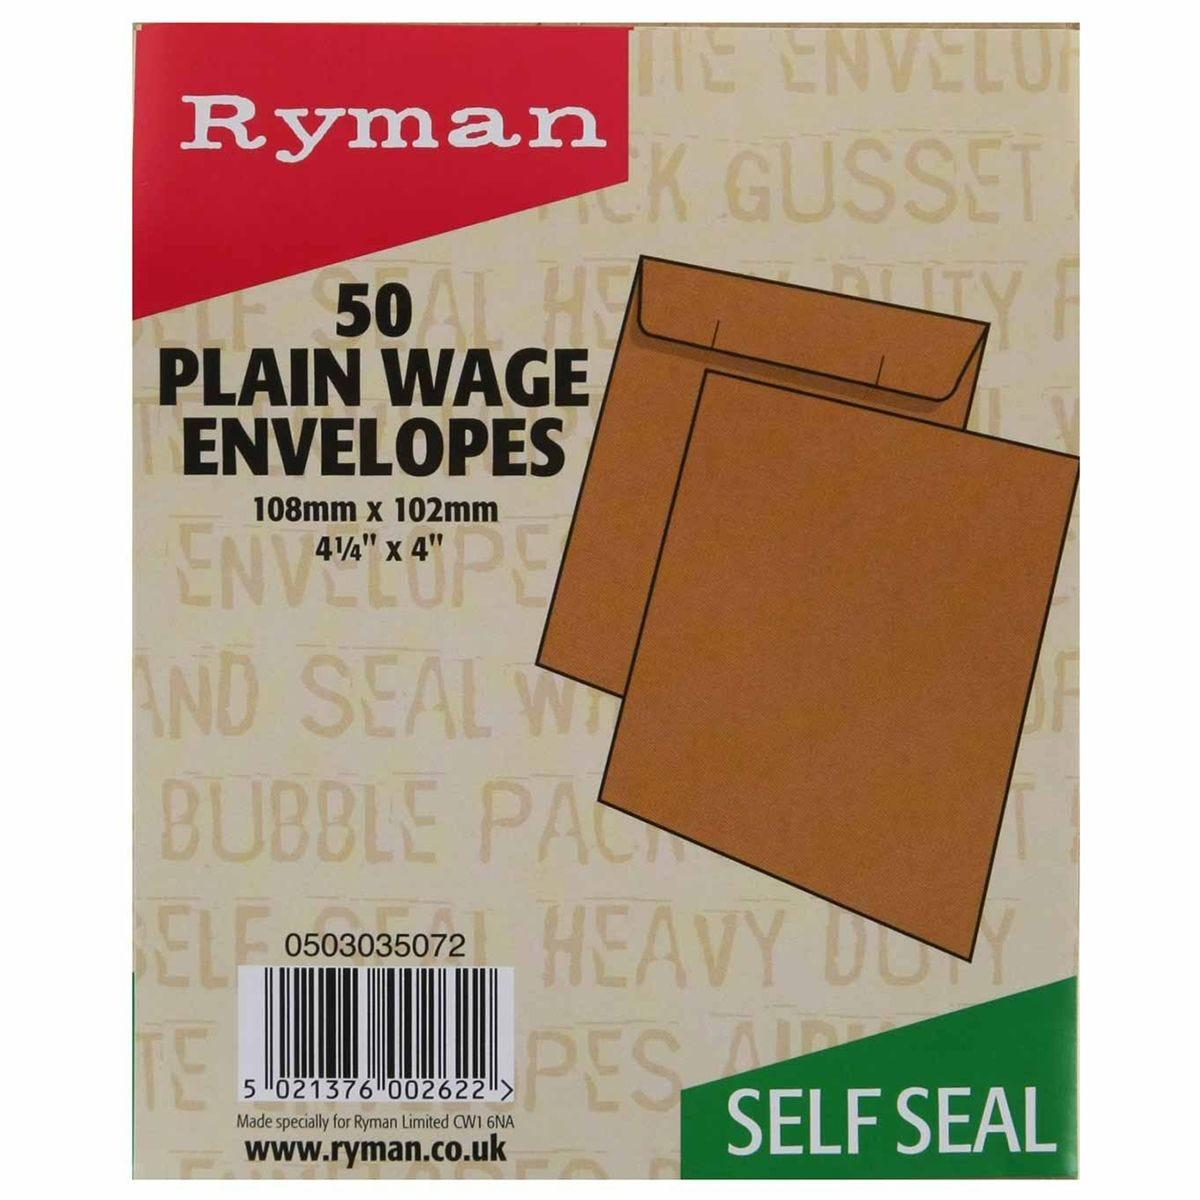 Ryman Wage Envelopes 108x102mm Self Seal Plain - Pack of 50